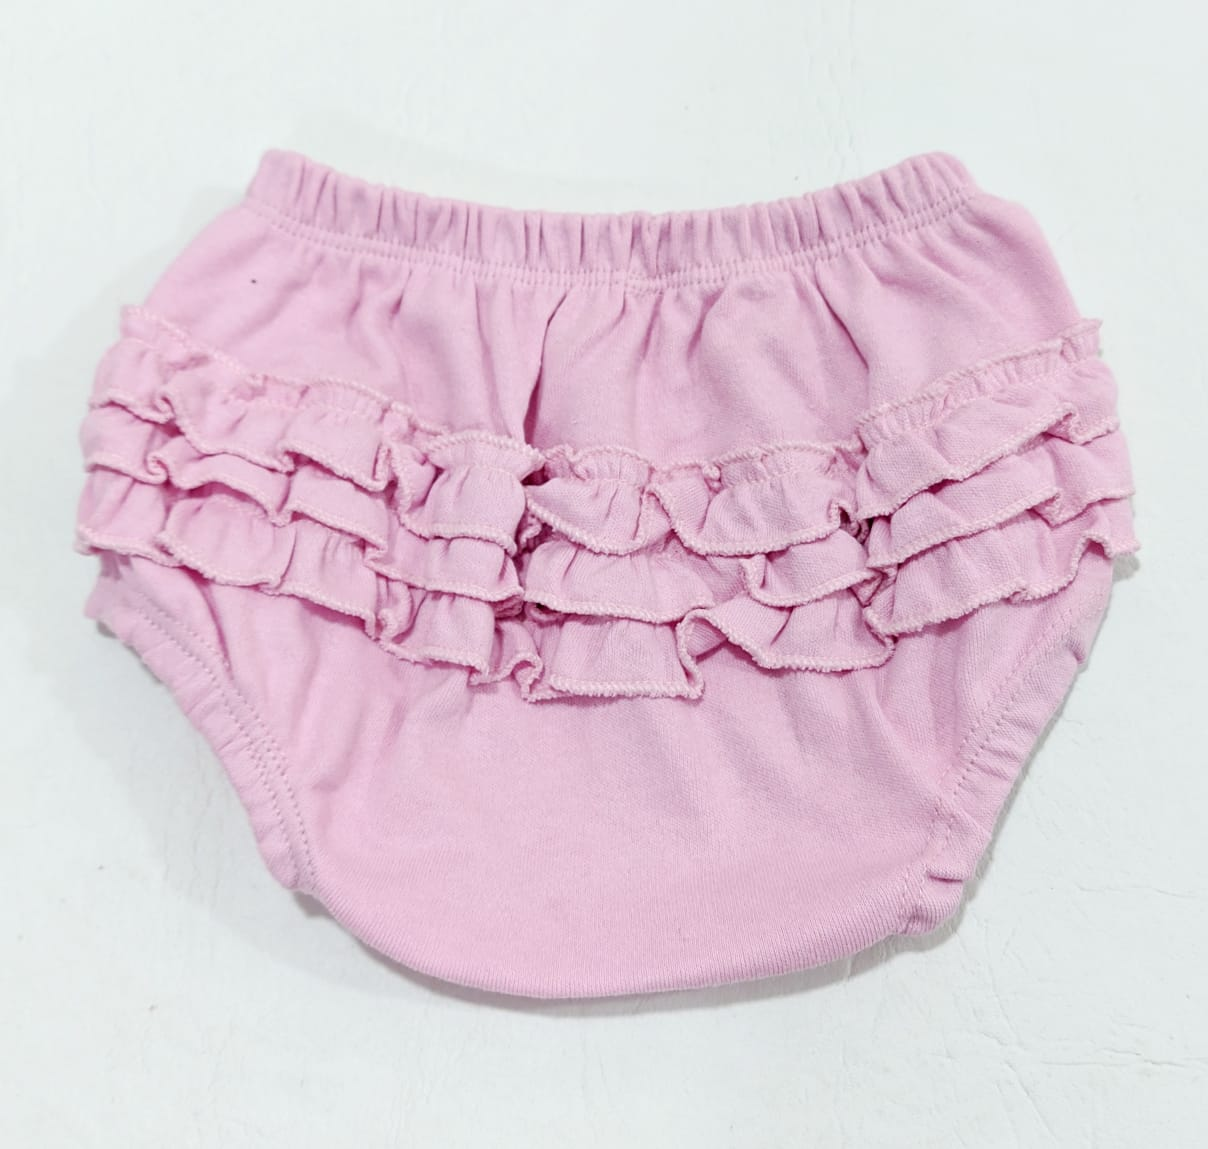 Tapa Fralda Liso - Babados - 100% Algodão Suedine - 0 à 2 meses - Yala Baby